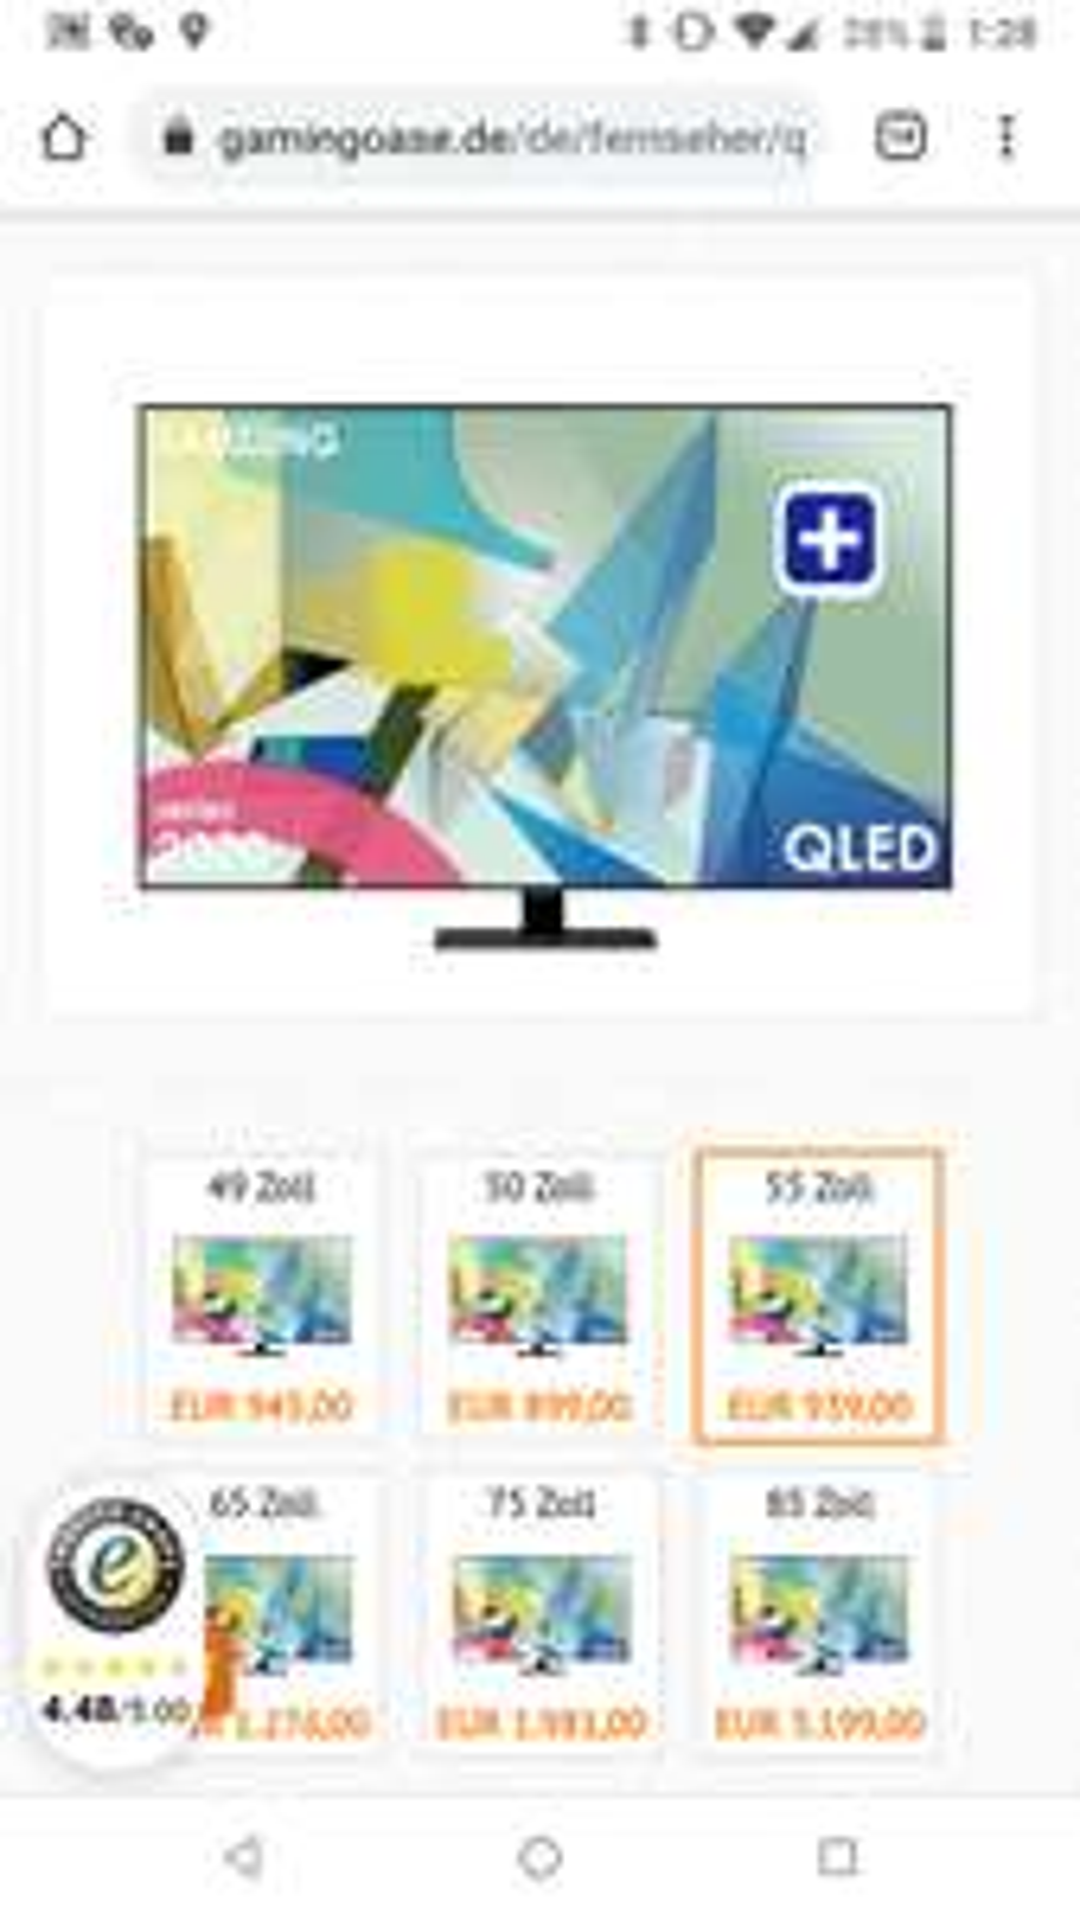 Samsung QLED Q55Q80T 55 Zoll 4K UHD Smart TV Modell 2020